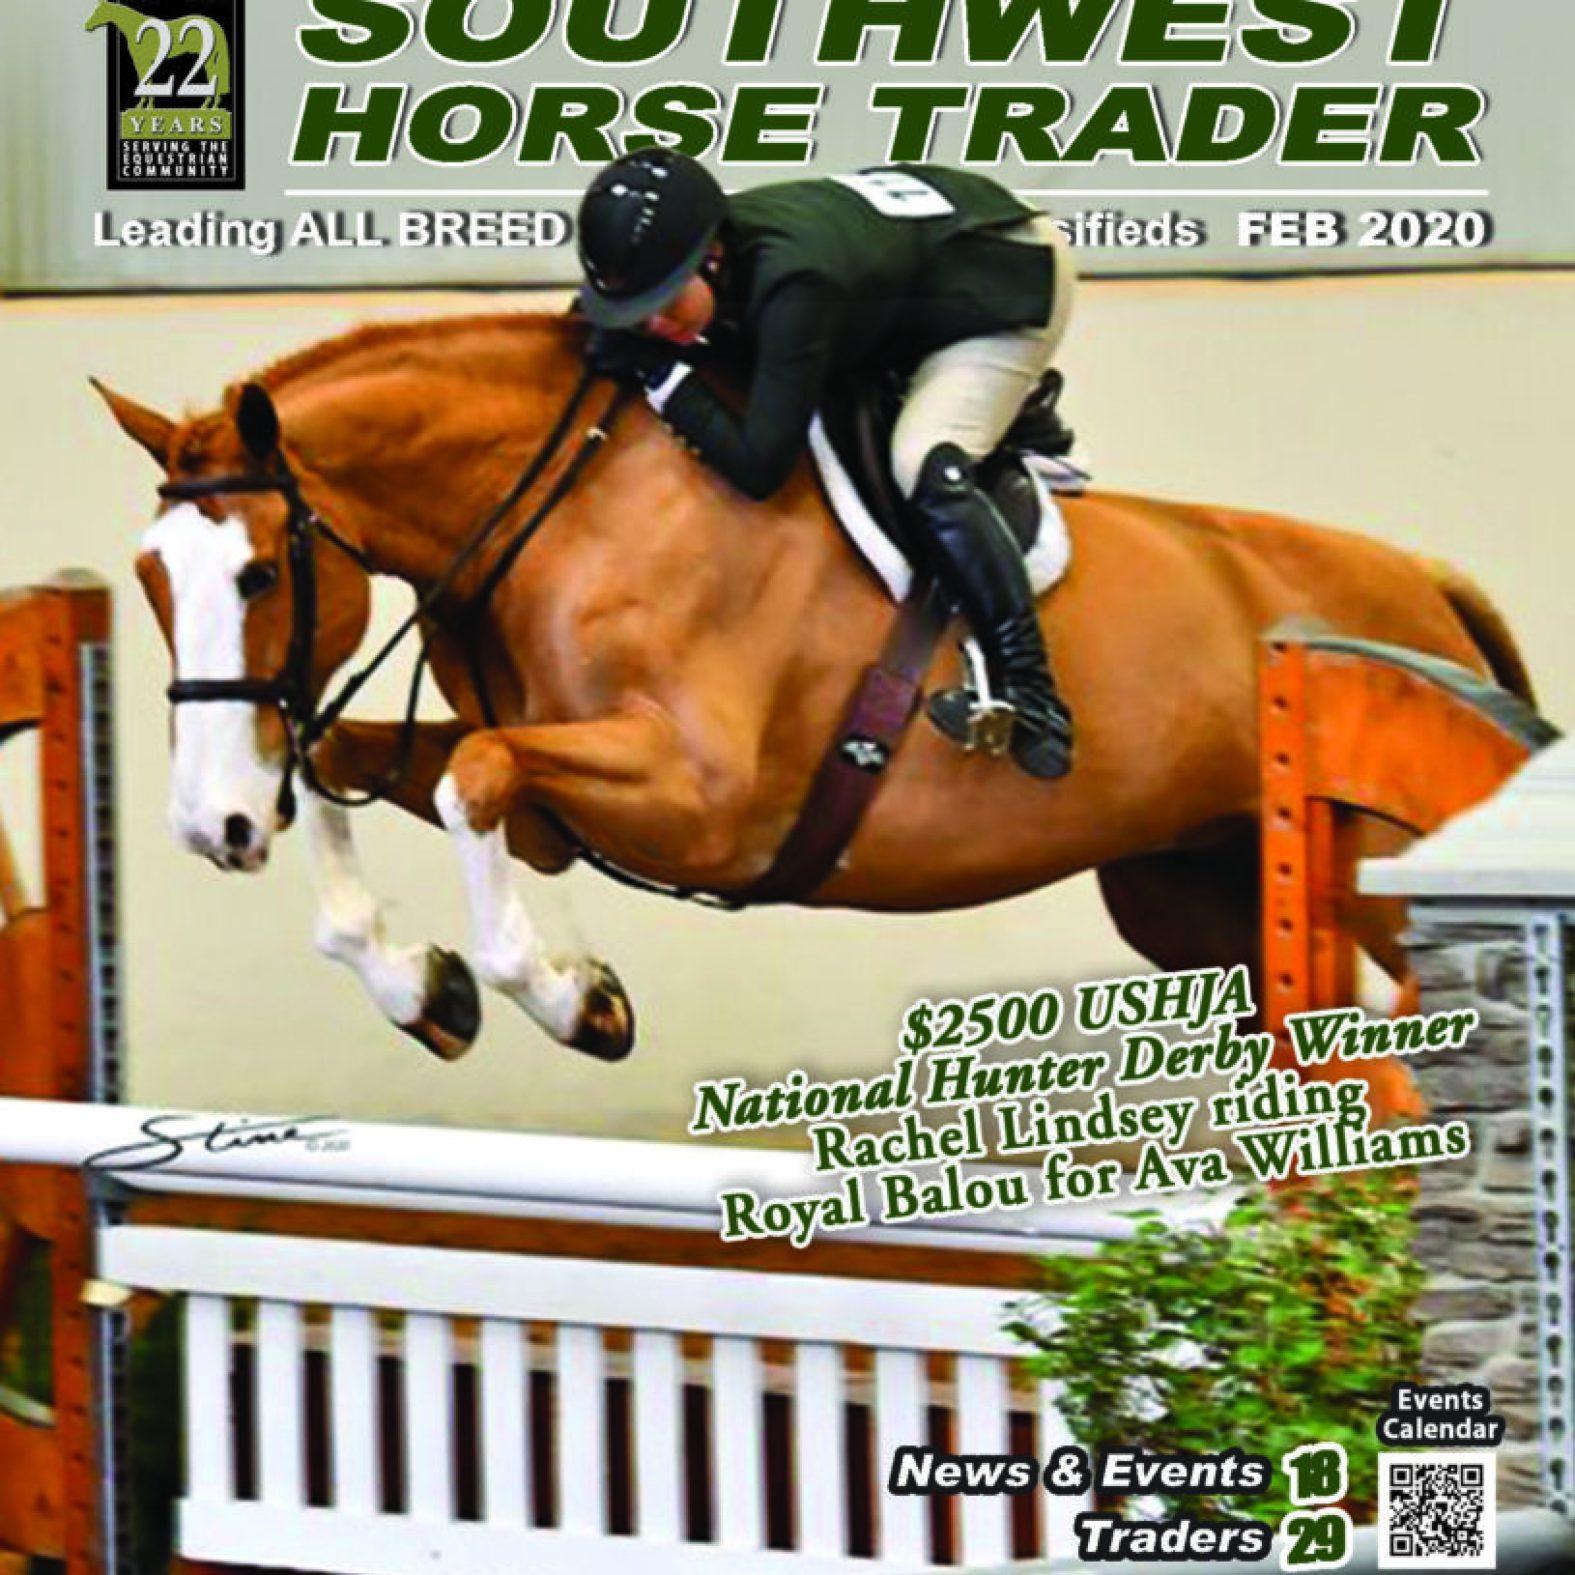 SouthWest Horse Trader February 2020 Issue